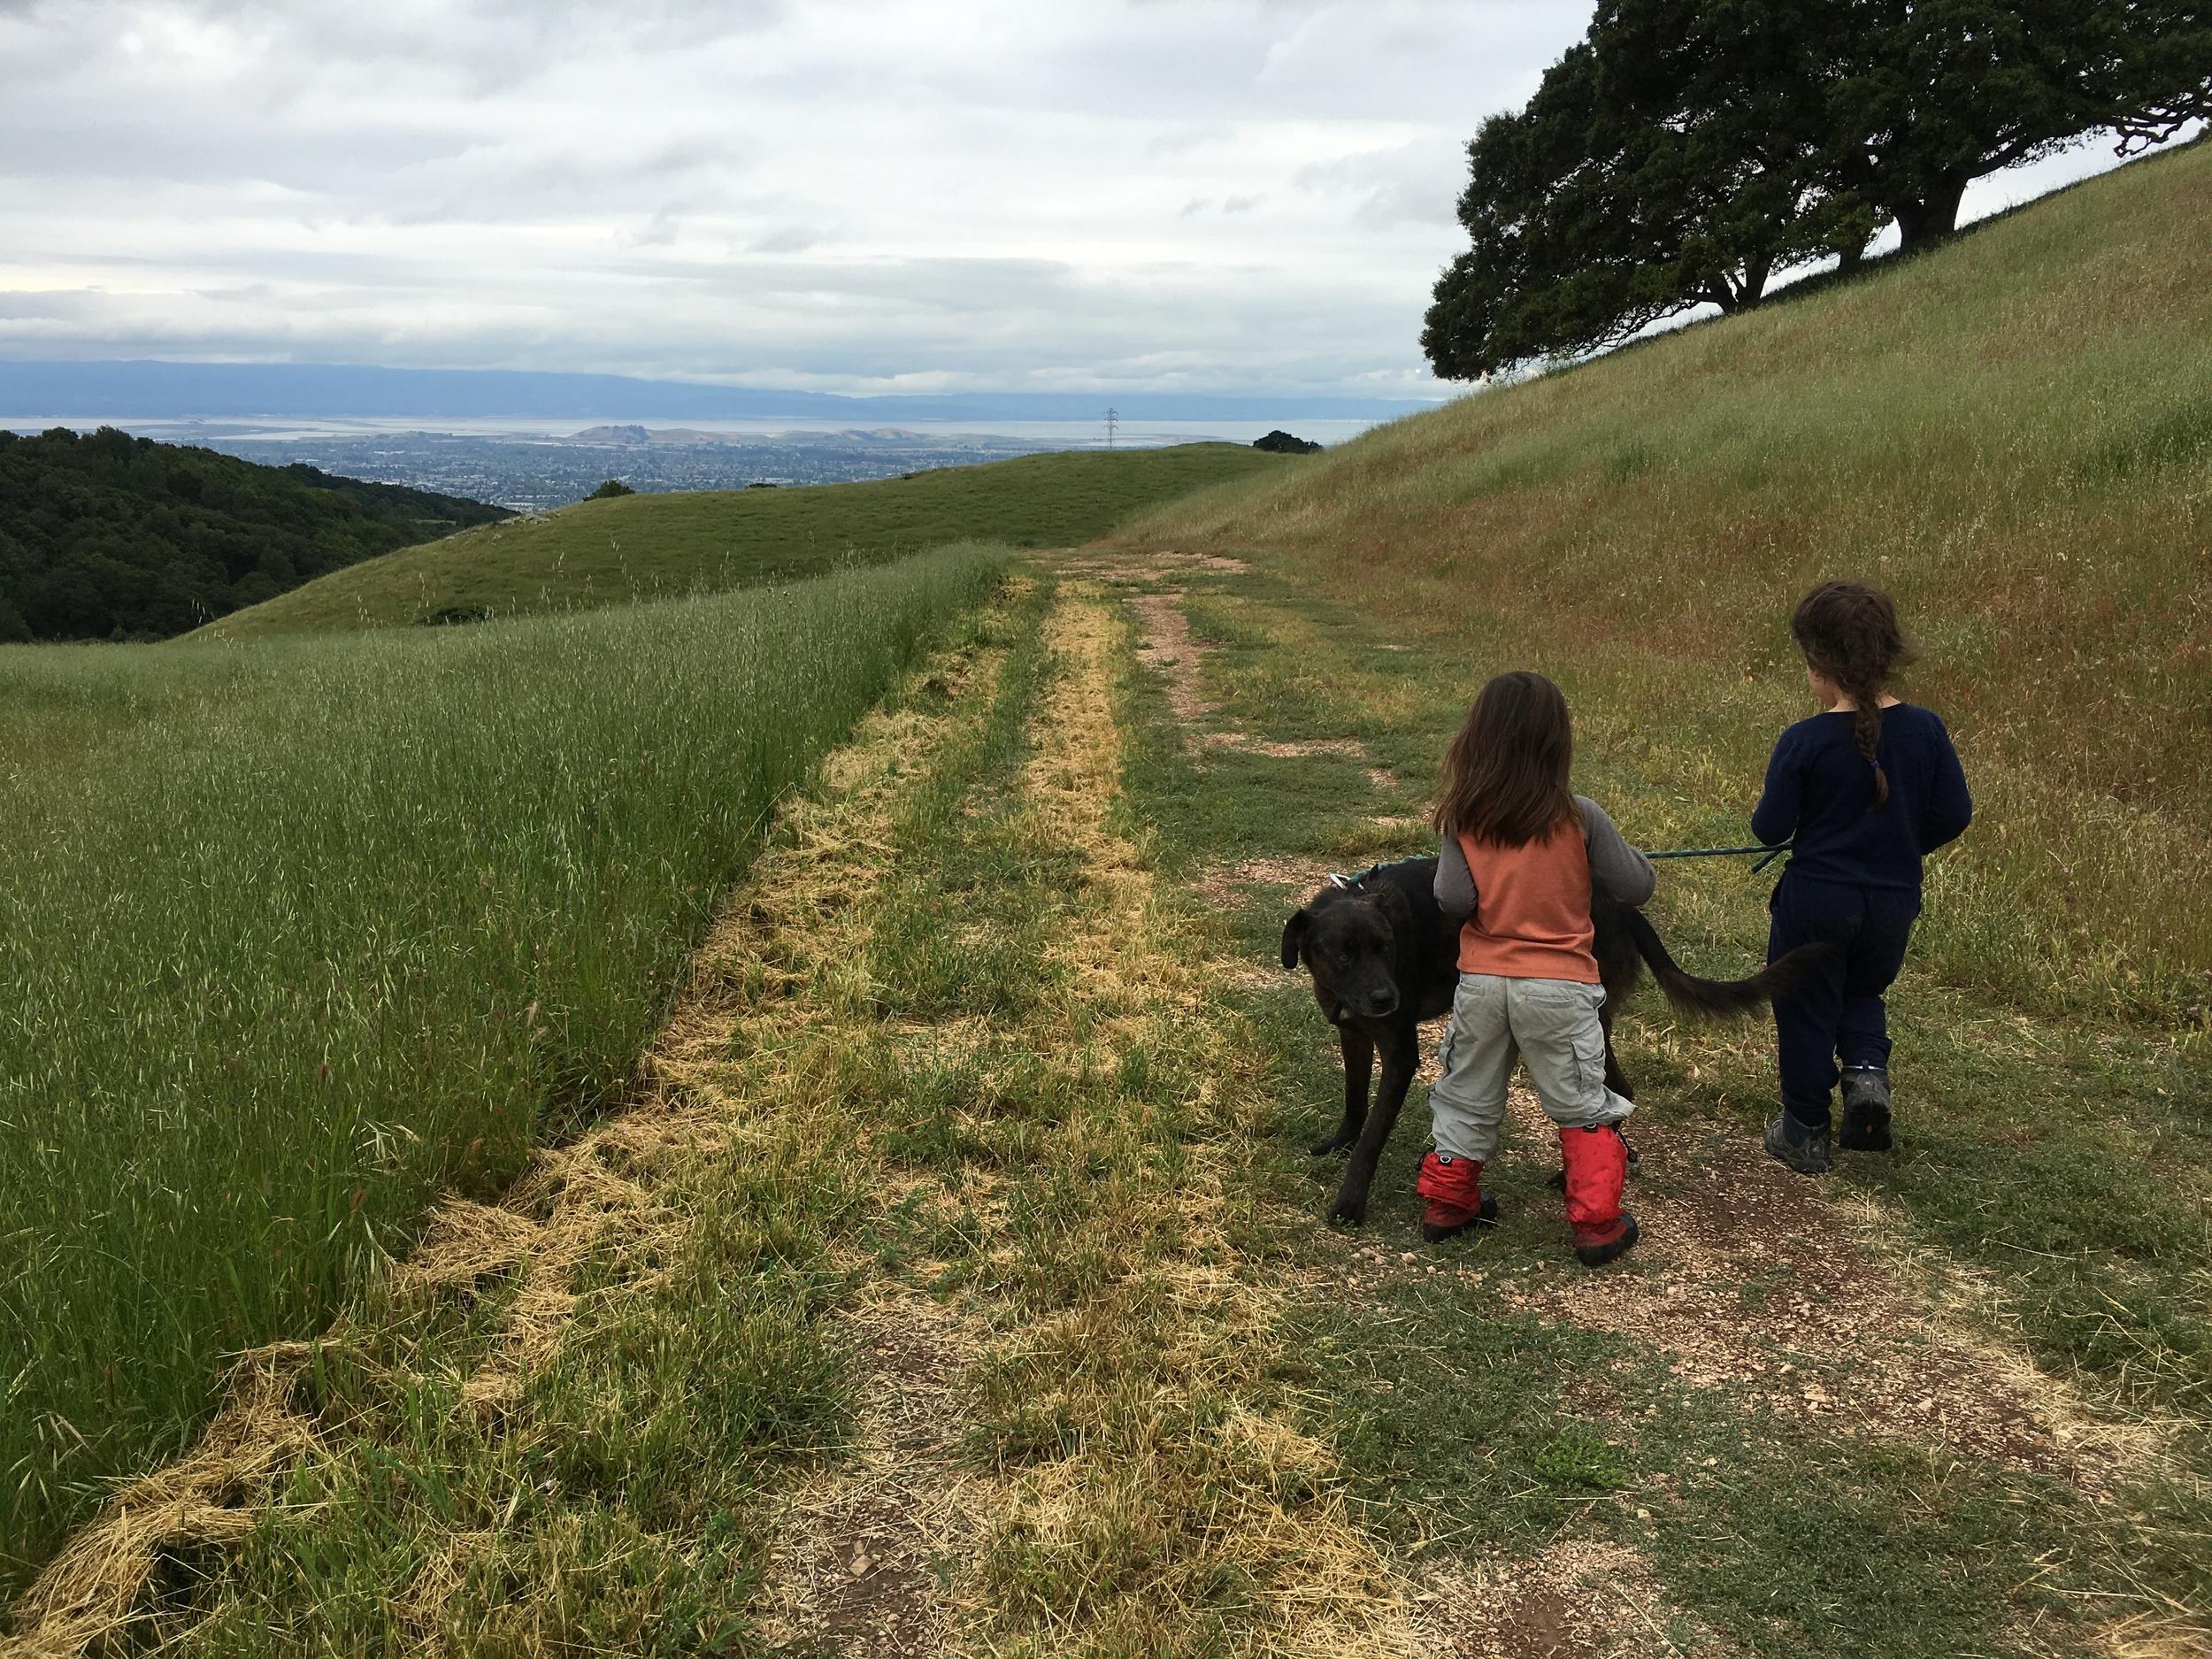 Dogs Love Vargas Plateau too!